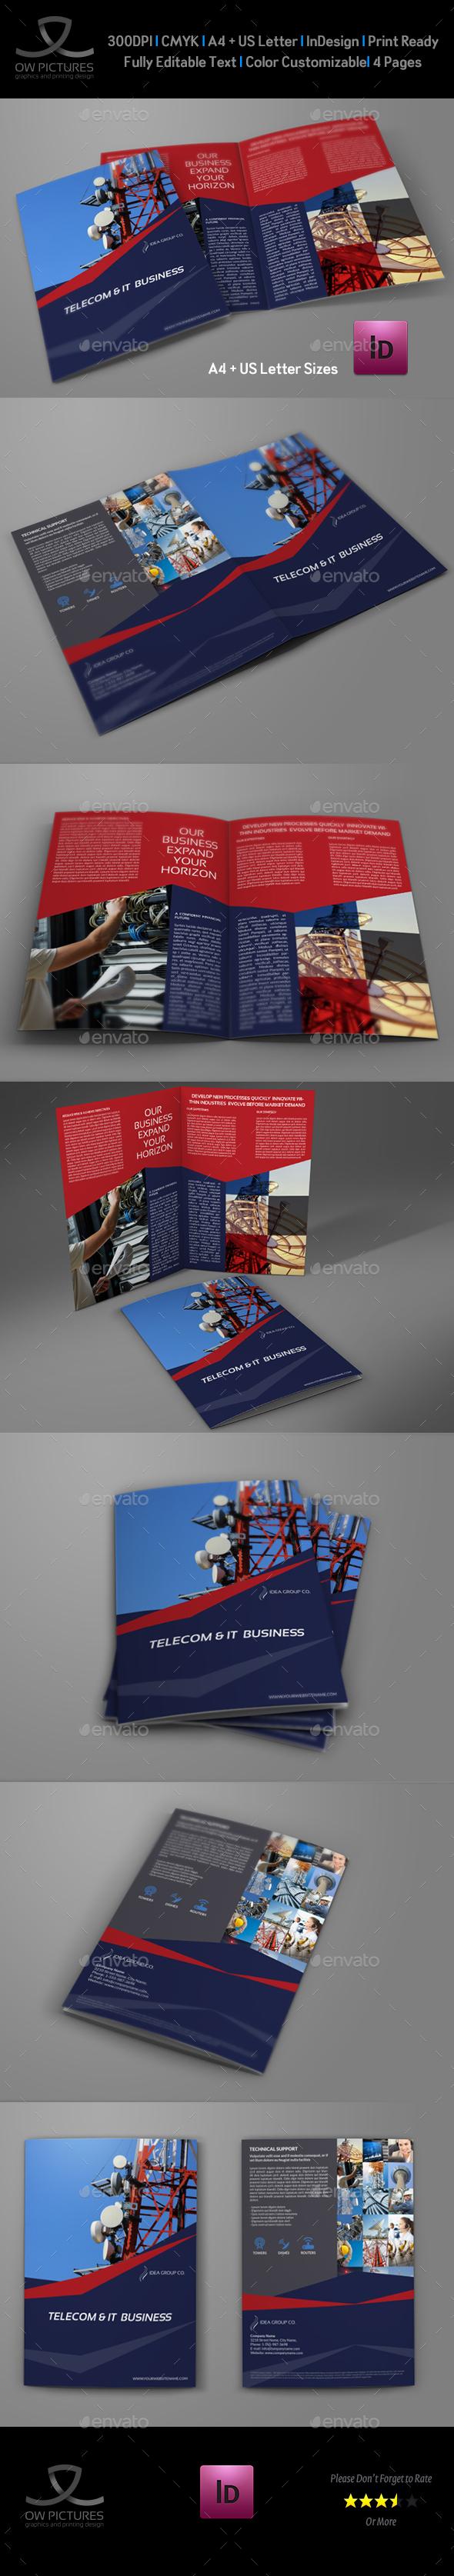 Telecom Services Bi Fold Brochure Template - Brochures Print Templates